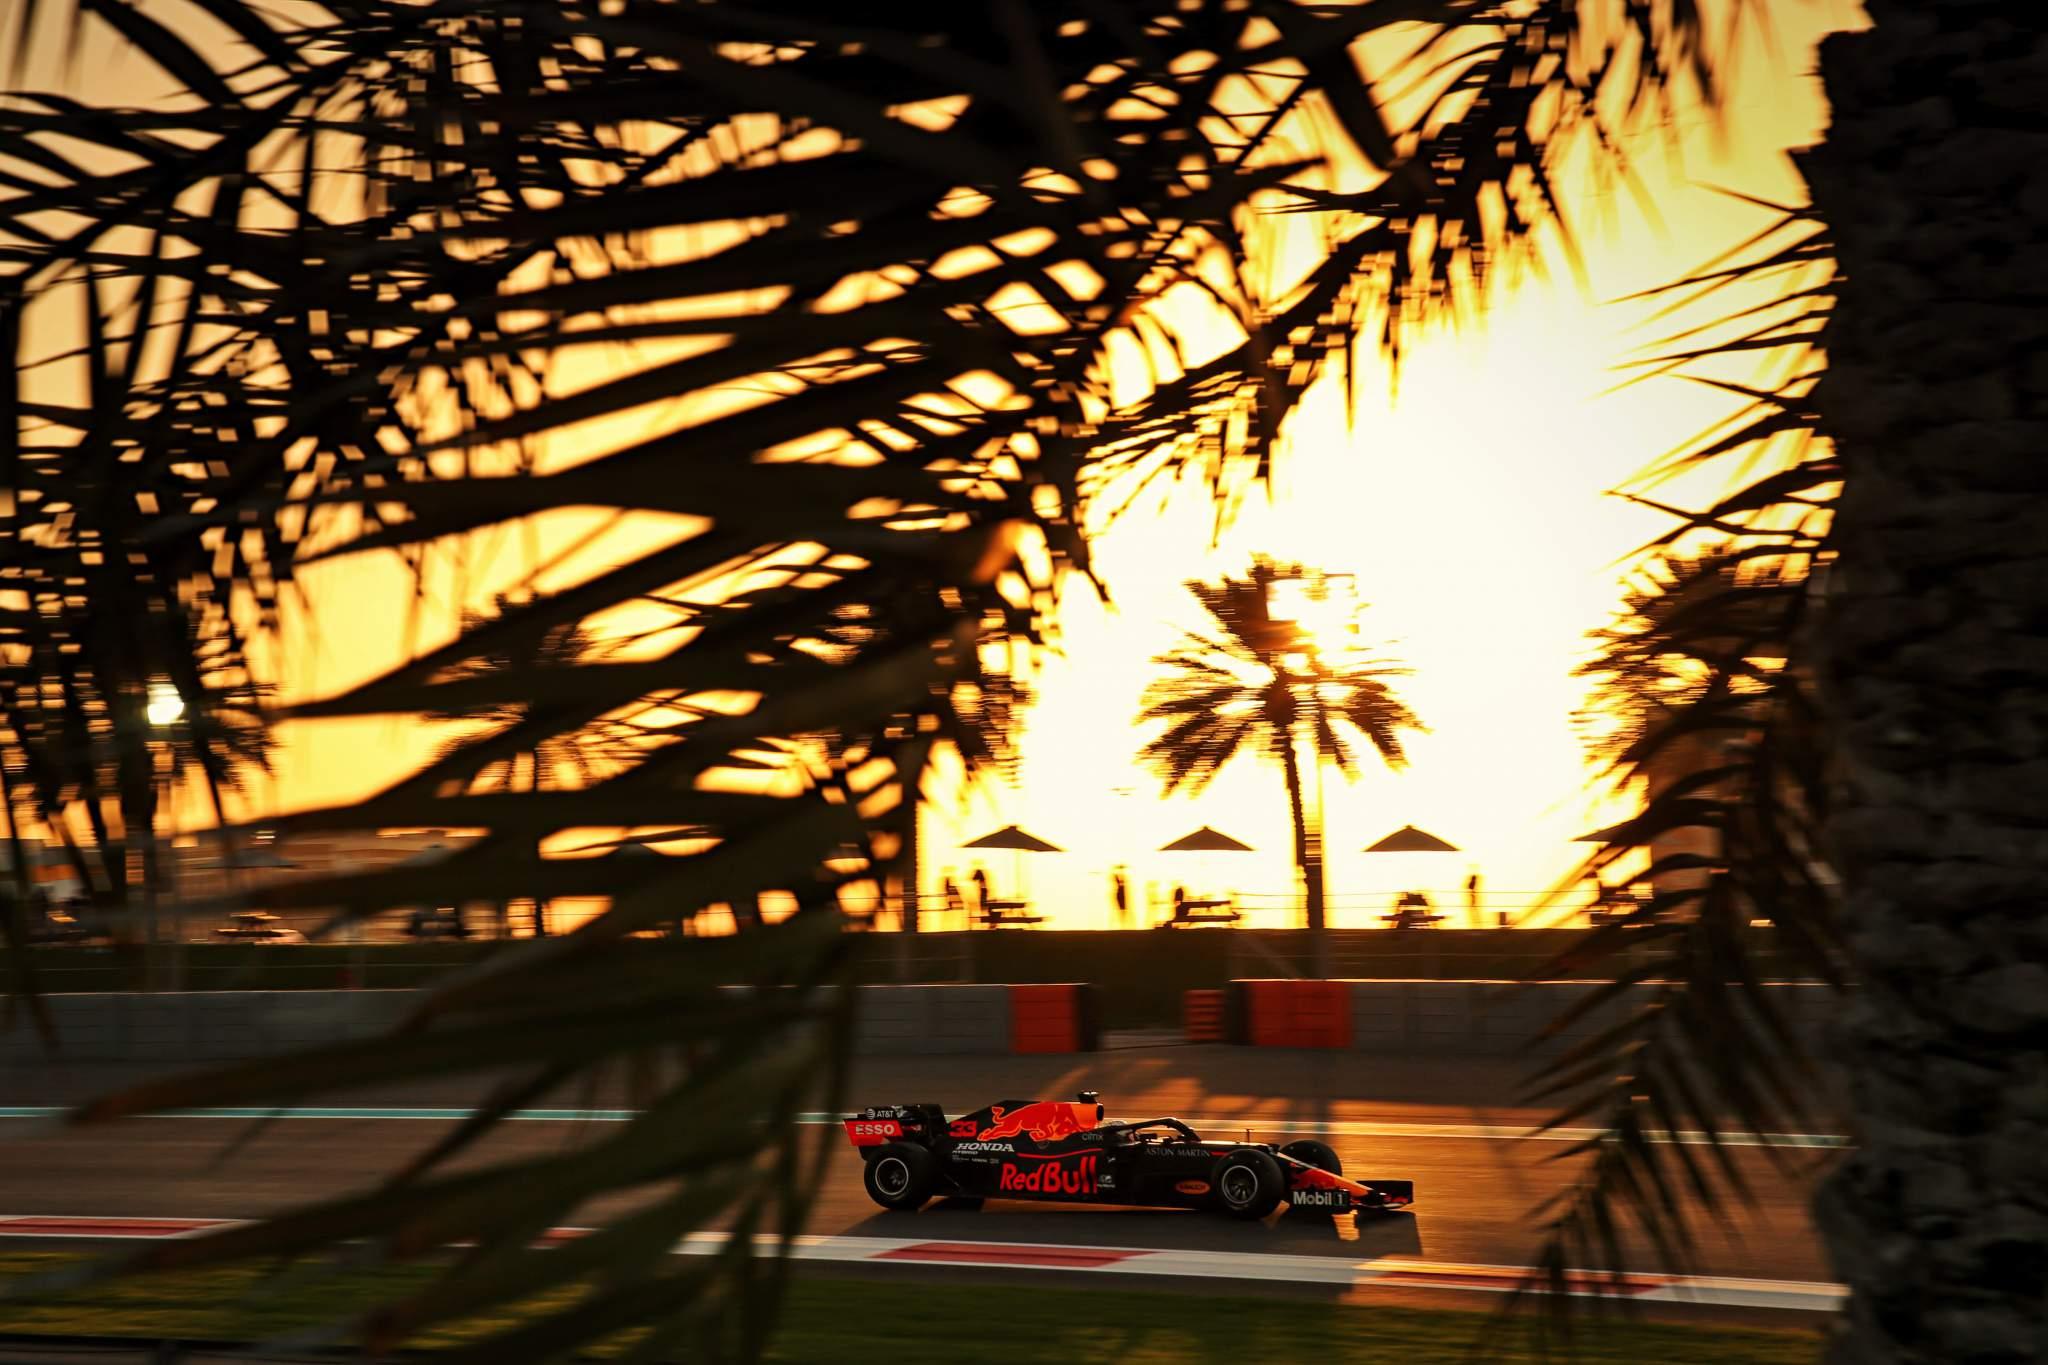 Max Verstappen Red Bull Abu Dhabi Grand Prix 2020